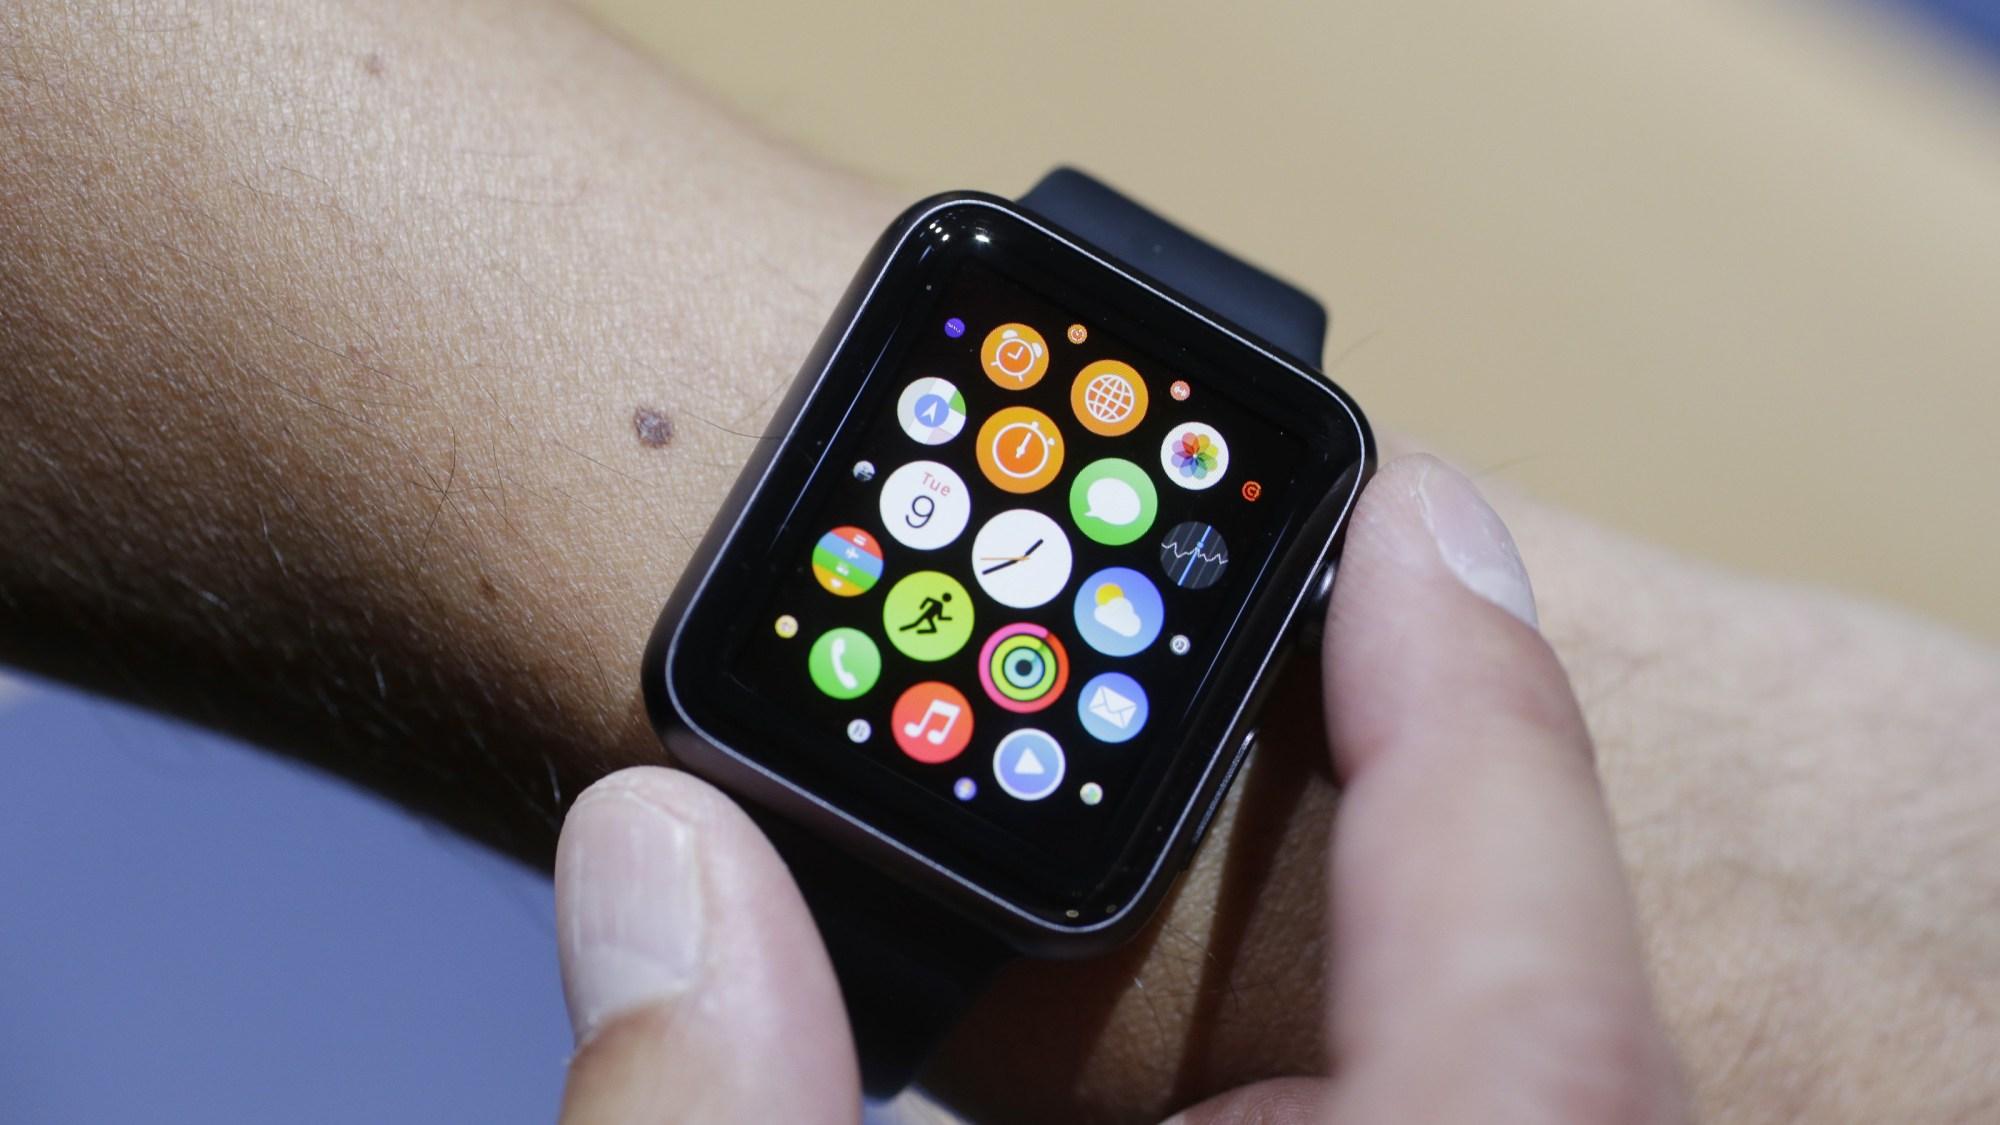 Apple Watch am Handgelenk: Schwacher Akku?